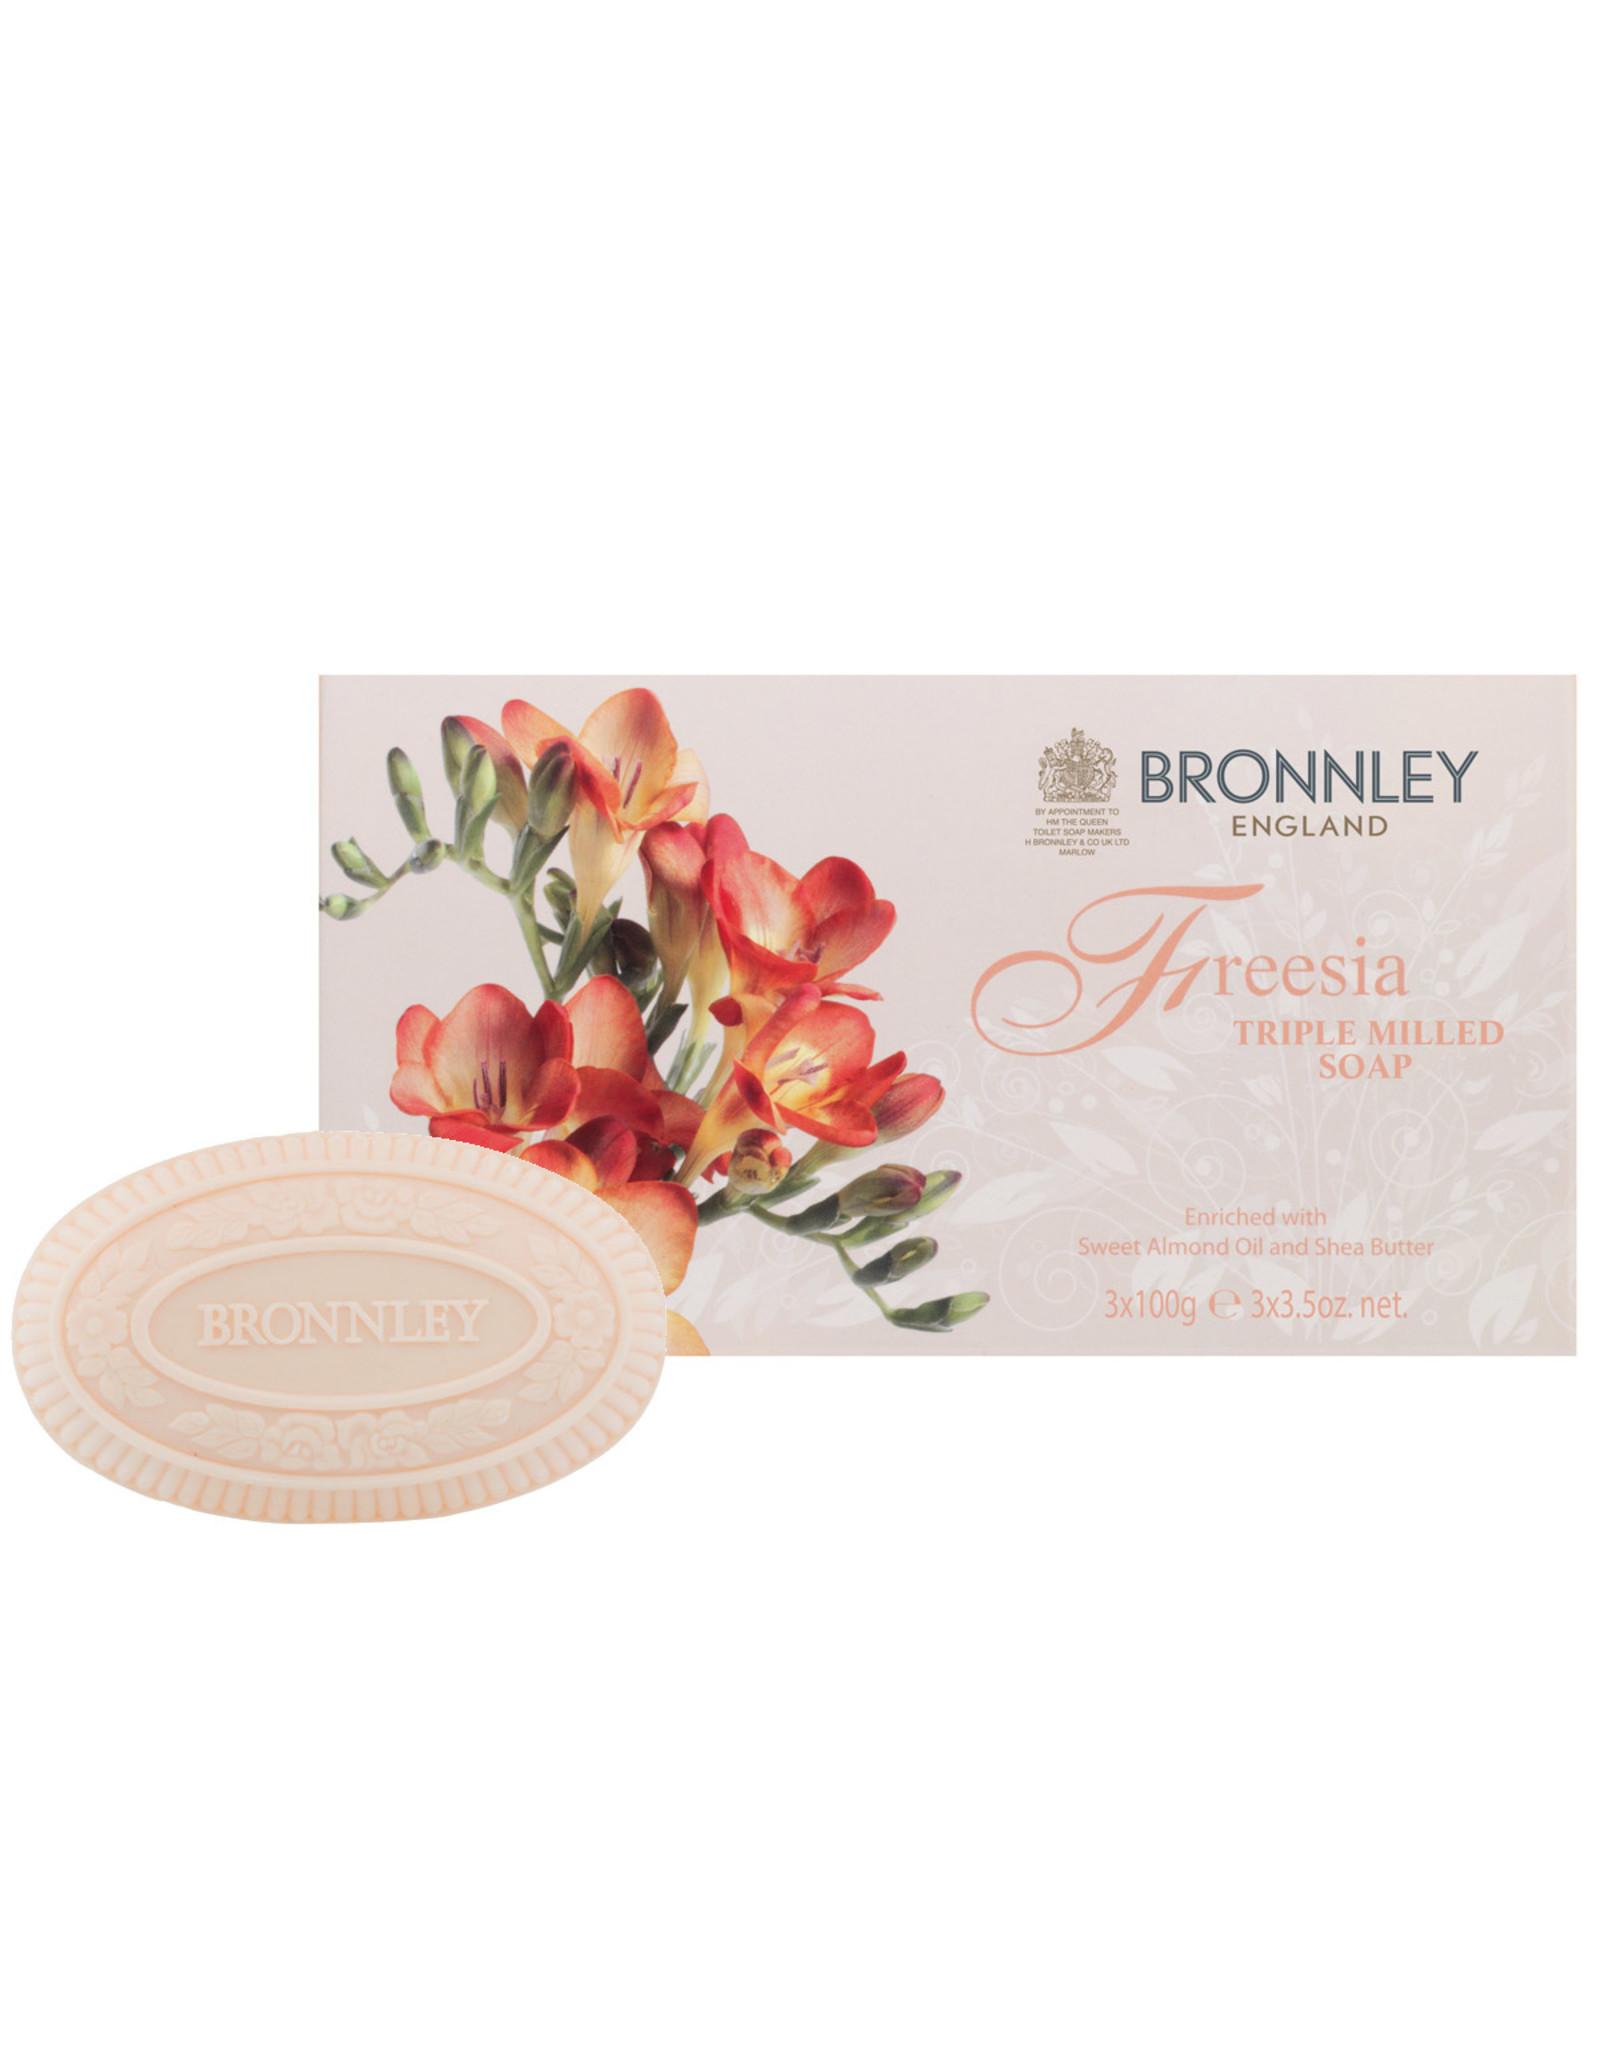 Bronnley Freesia Triple Milled Fine Soap 3x100g